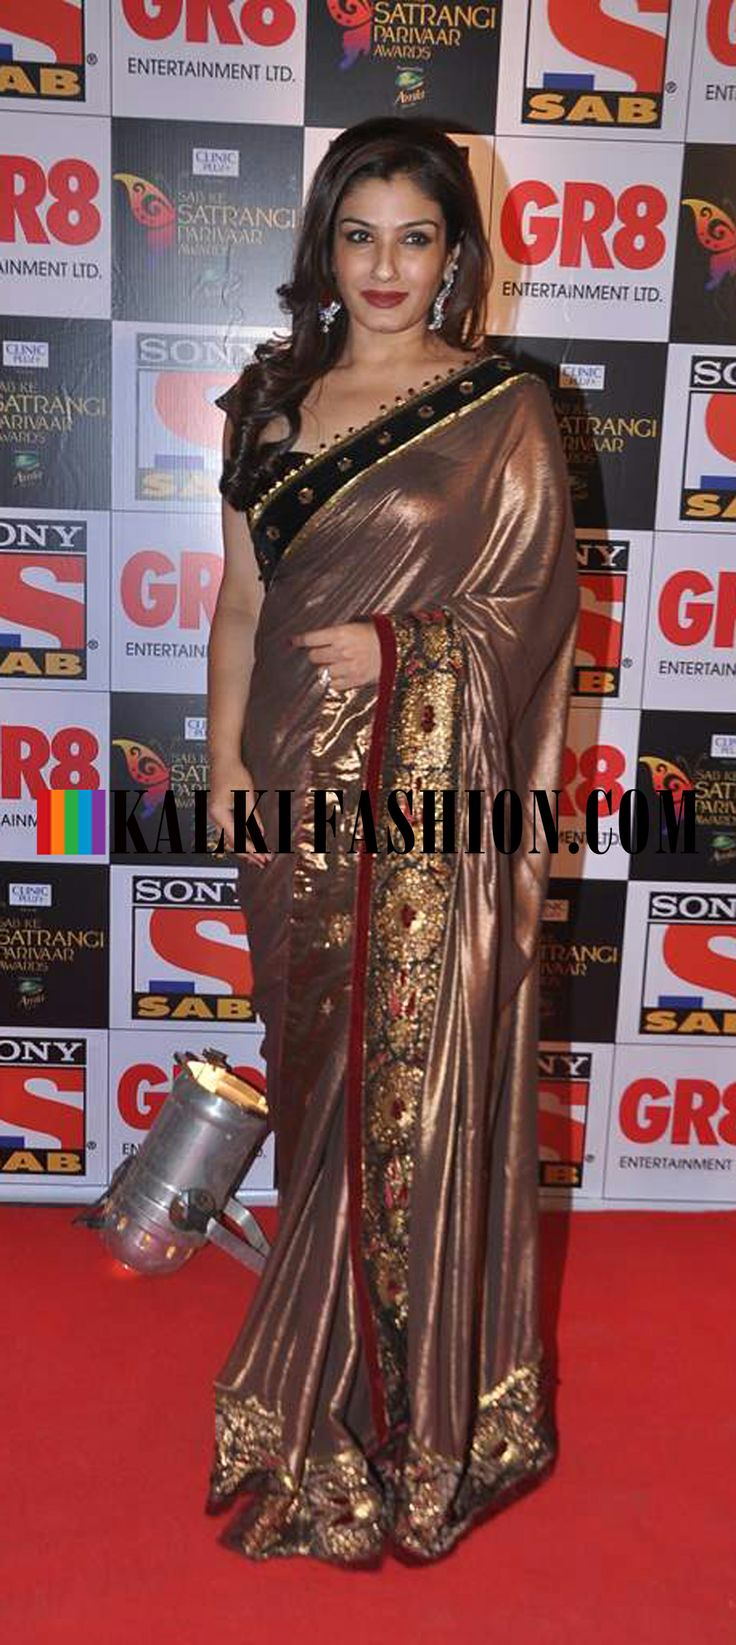 http://www.kalkifashion.com/ Raveena Tandon in a metallic bronze saree at SAB ke Satrangi Parivaar Awards